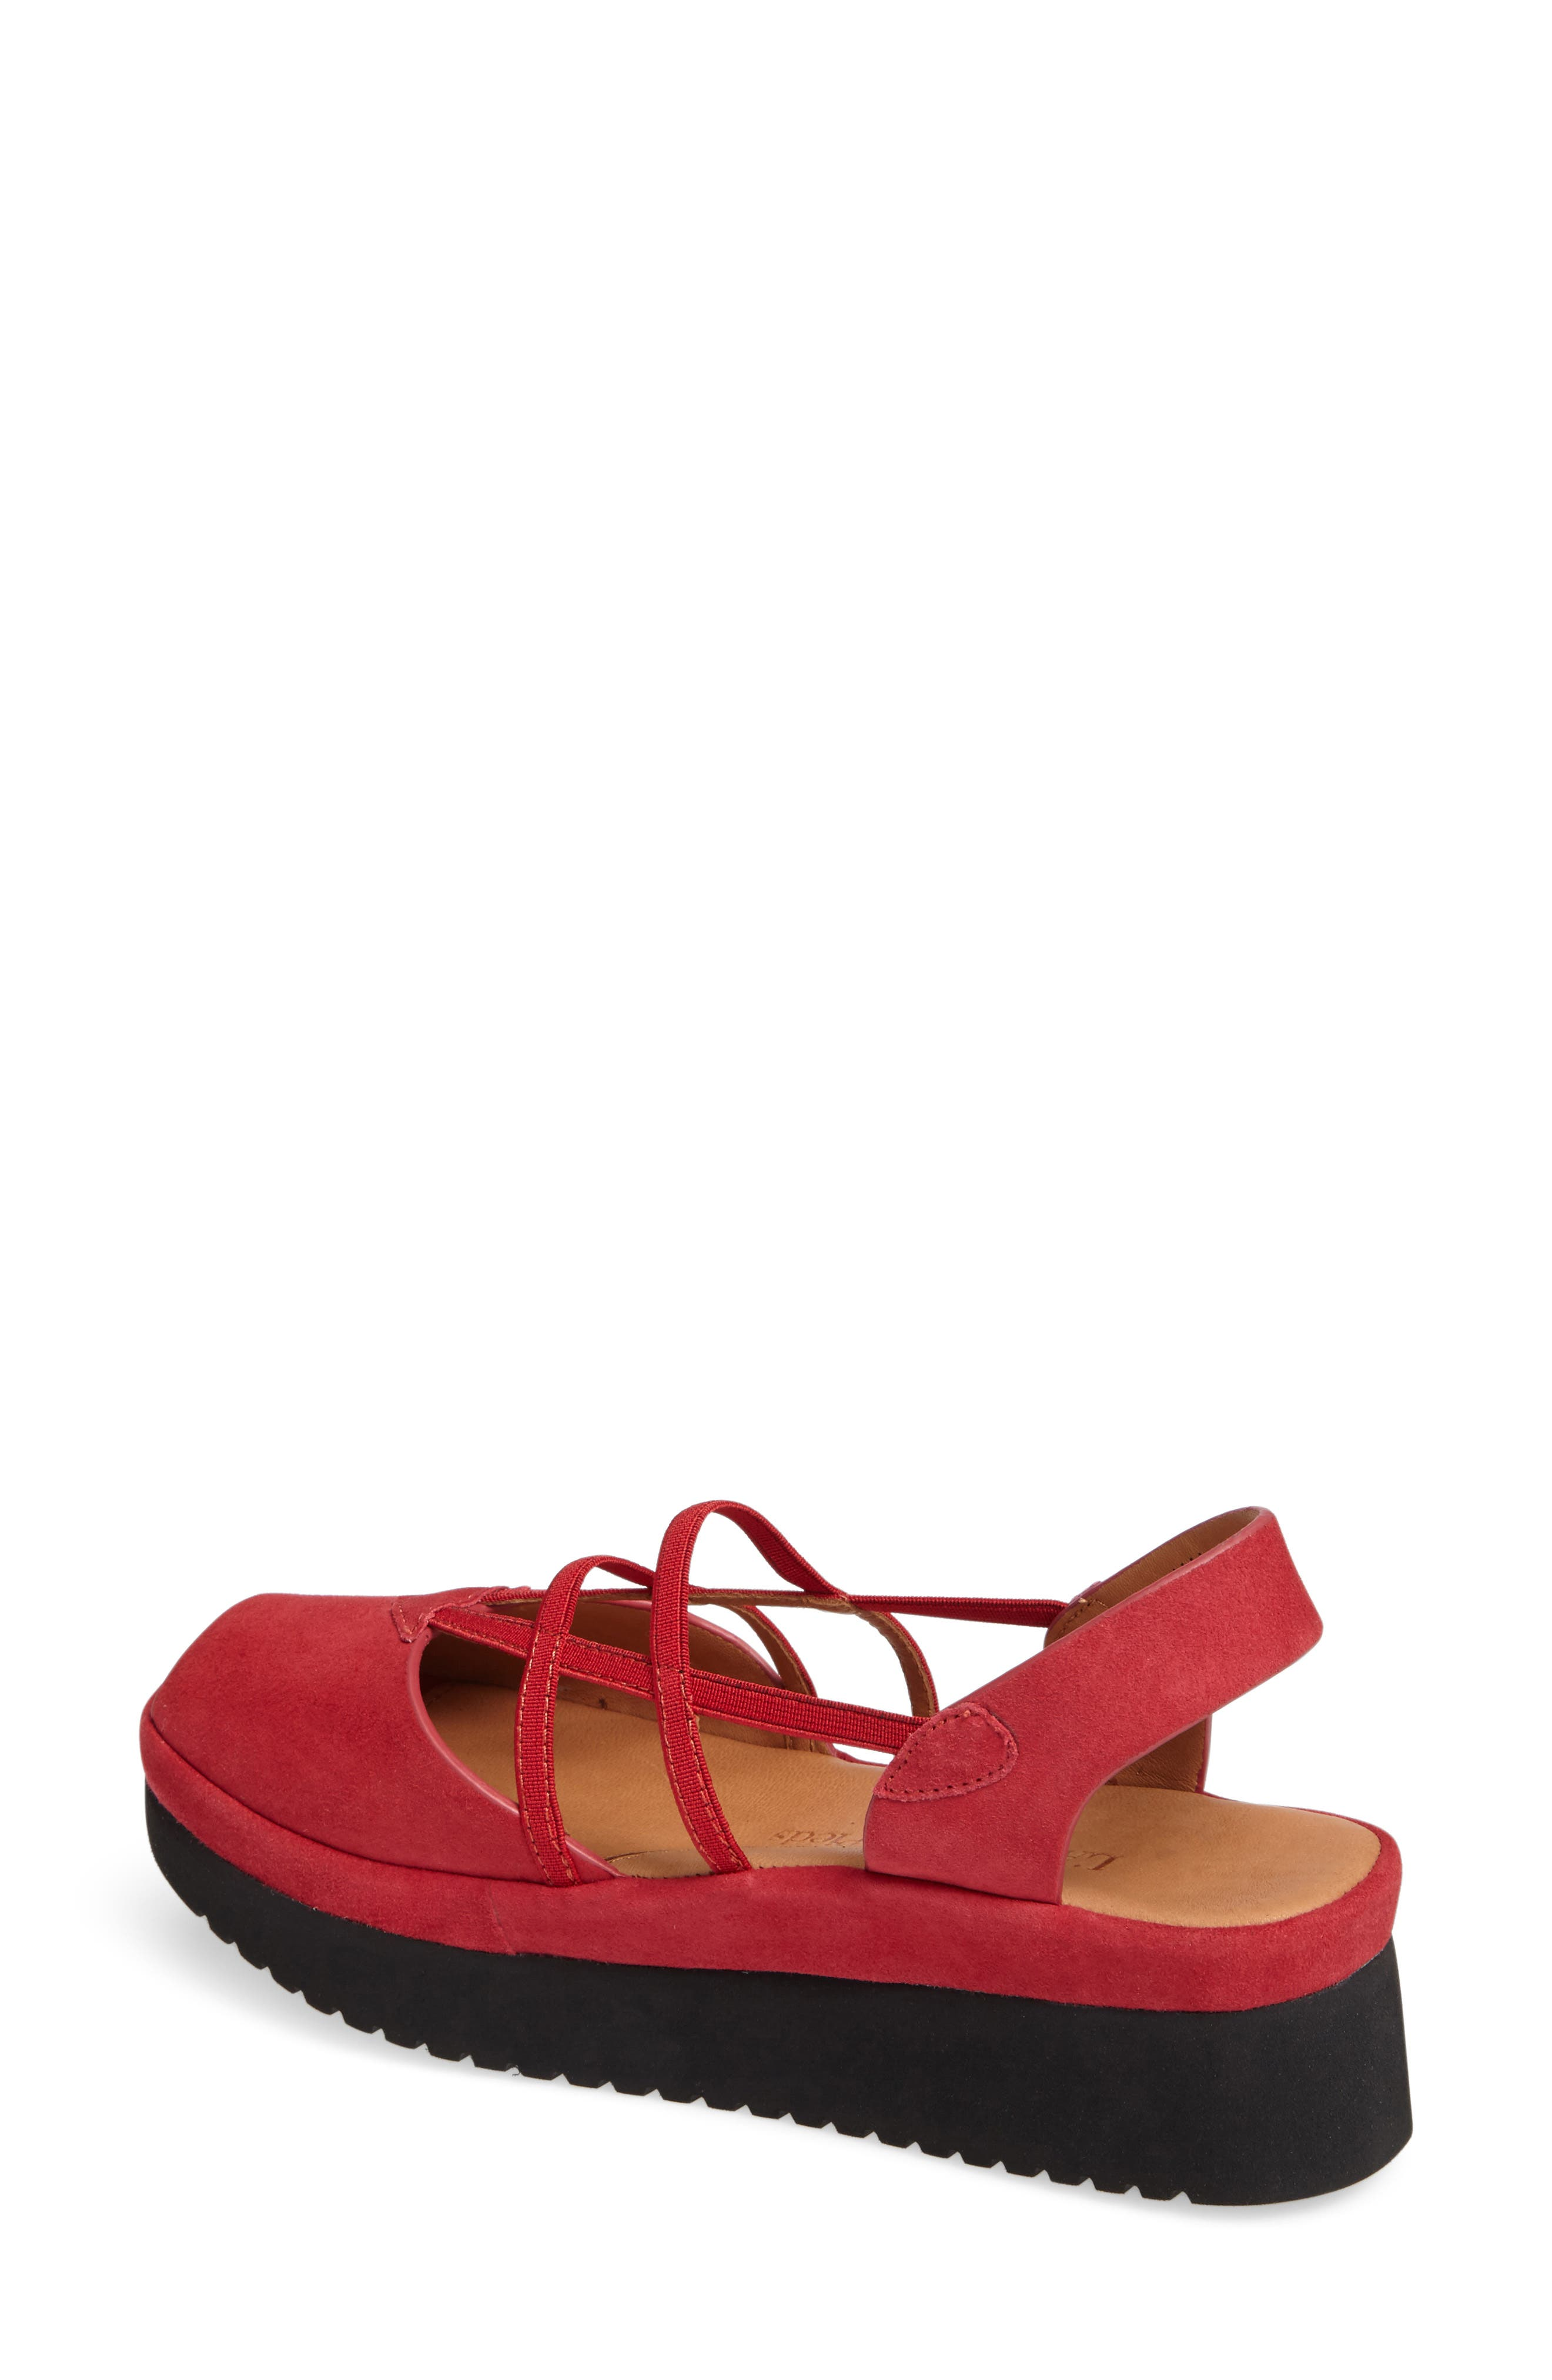 Adelais Platform Wedge Sandal,                             Alternate thumbnail 2, color,                             Red Nubuck Leather